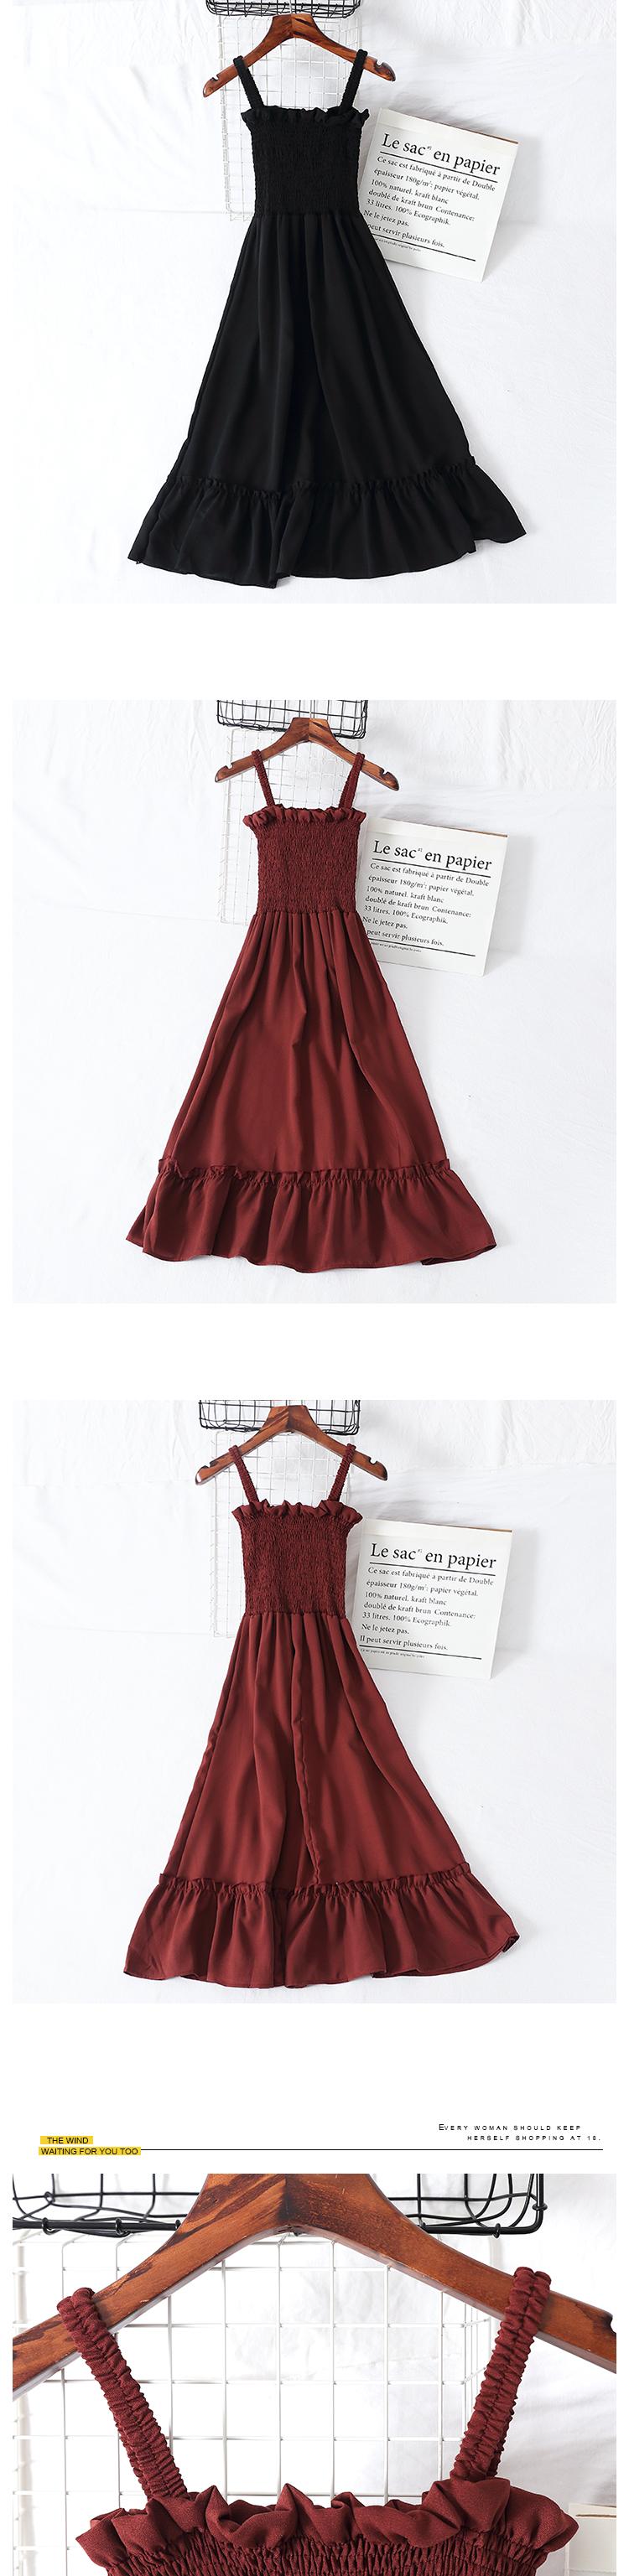 2018 Summer Sling Dress Ruffles Empire Long Dress Strapless Pink Dress Dress Female Party Gentlewoman Elegant Korean Style Cute 7